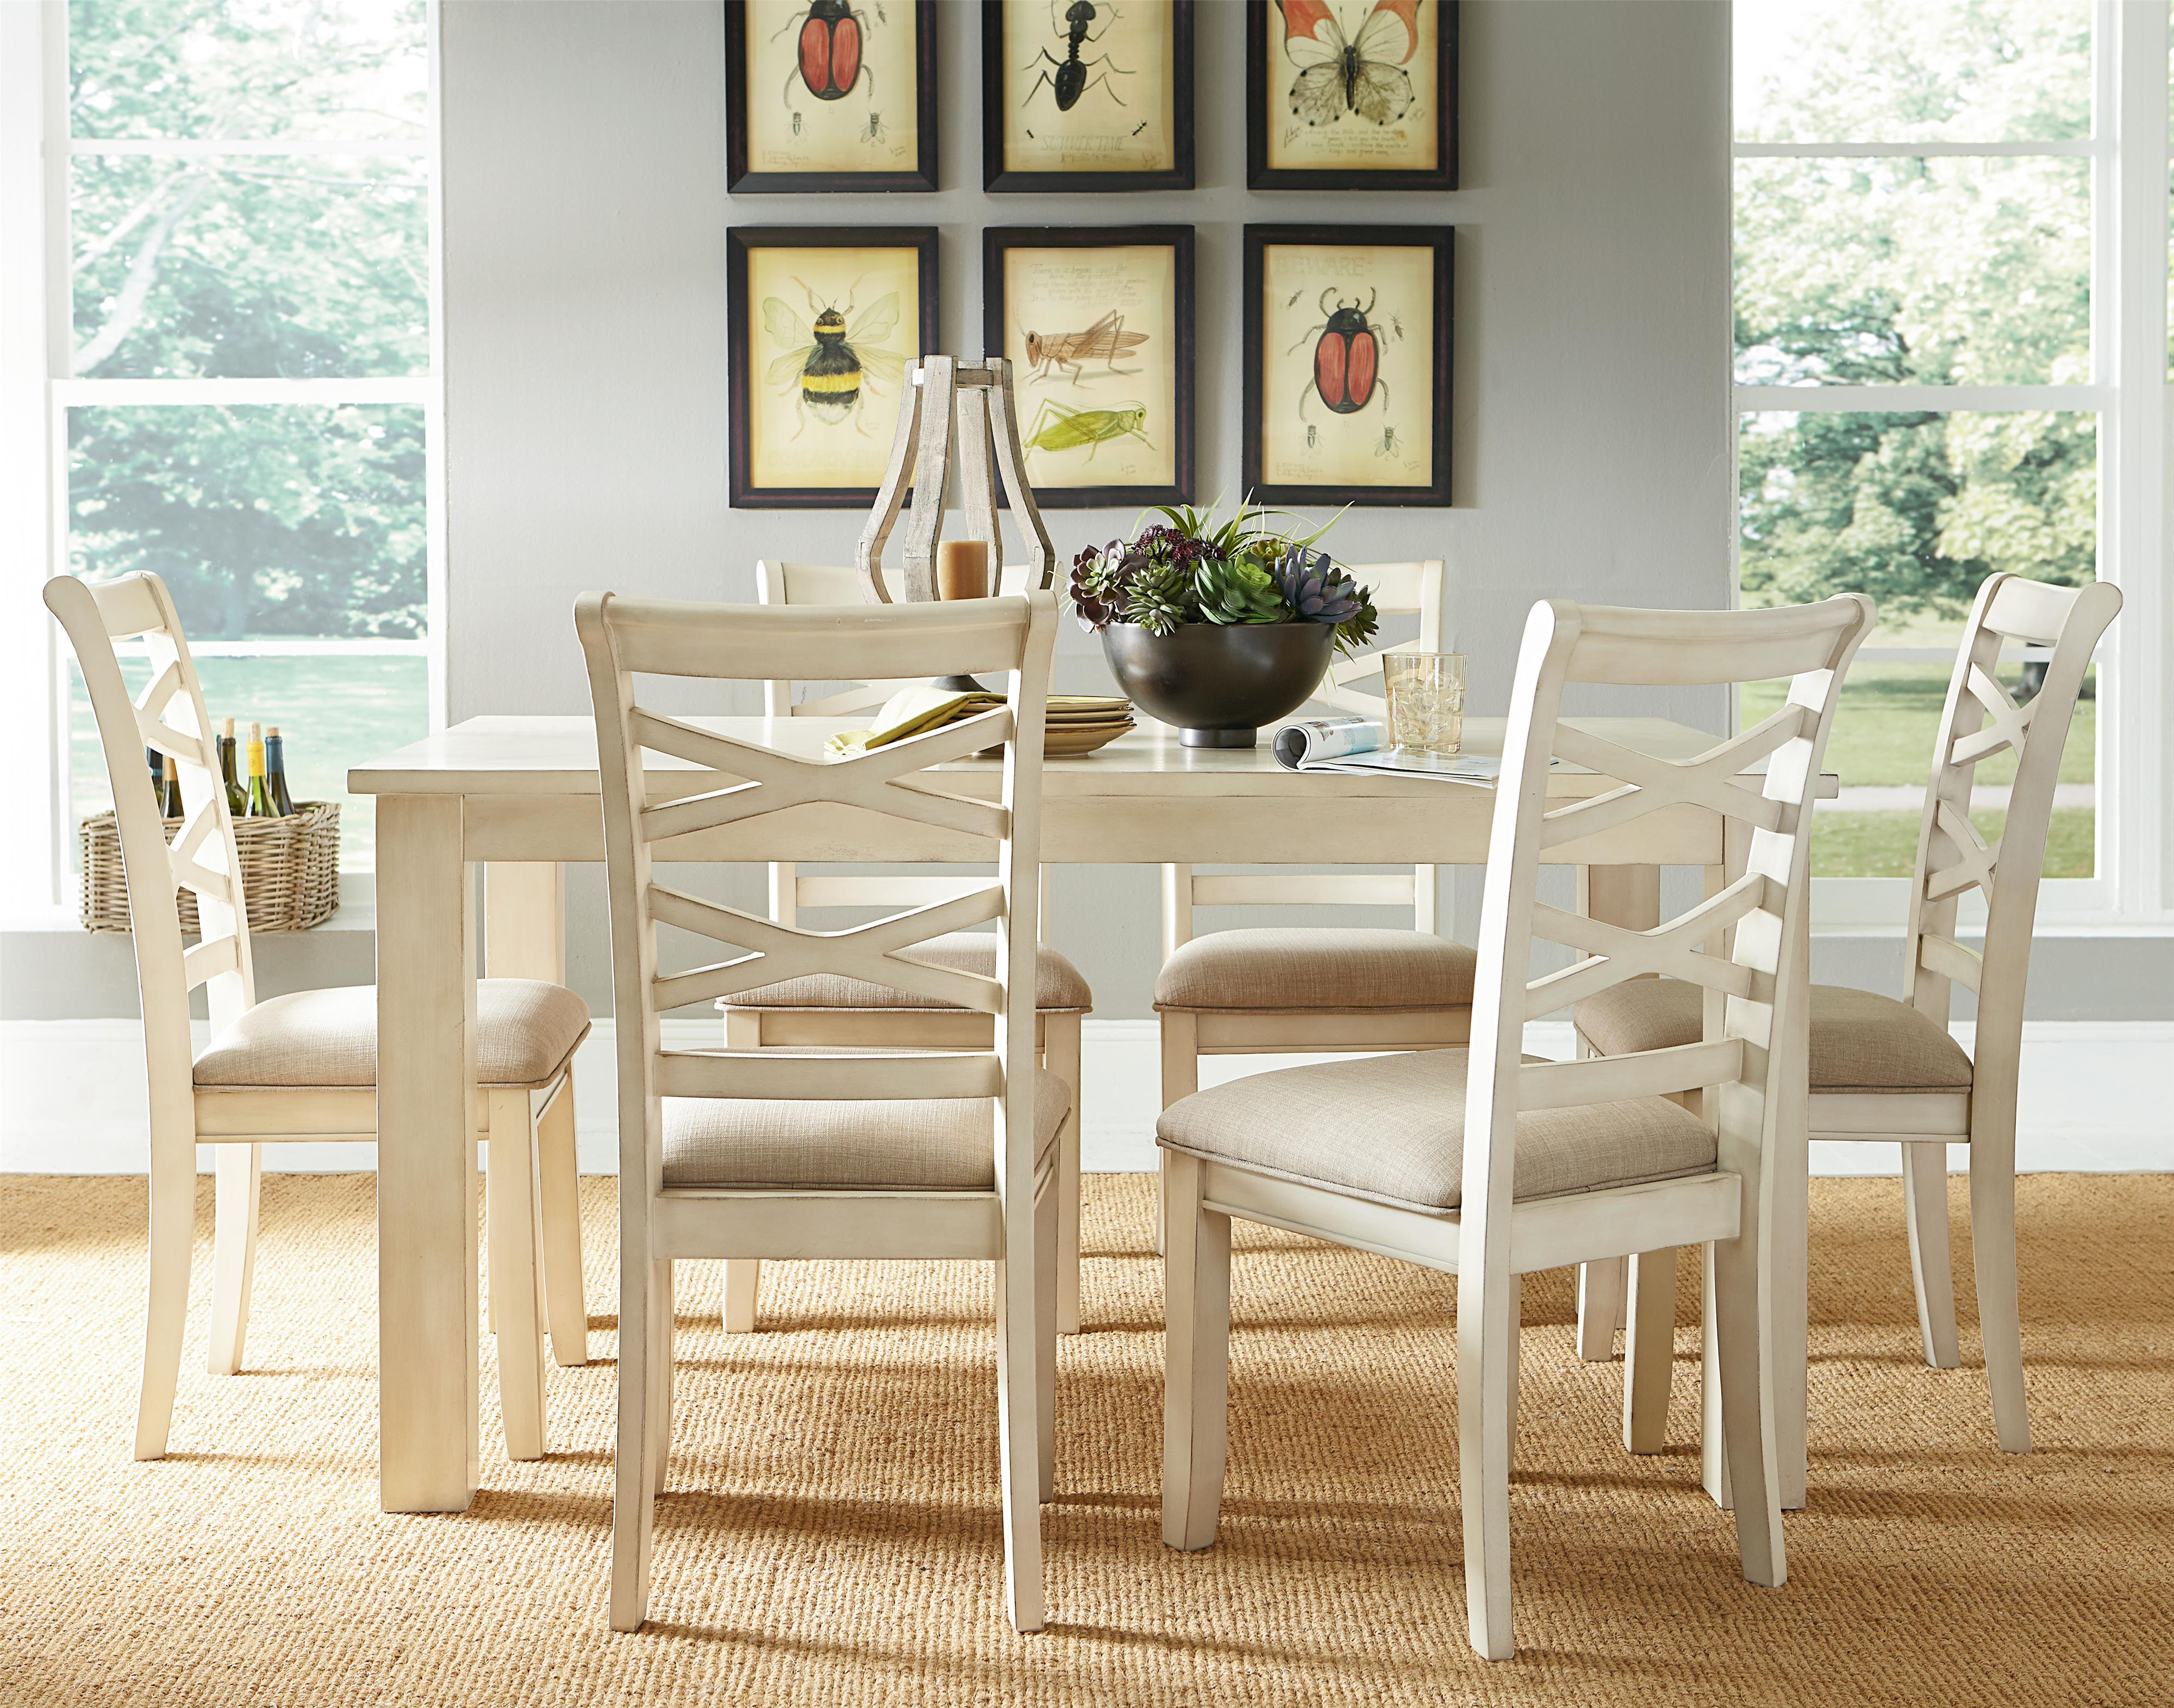 Standard Furniture Redondo Vanilla Casual Dining Room Set - Item Number: 11232